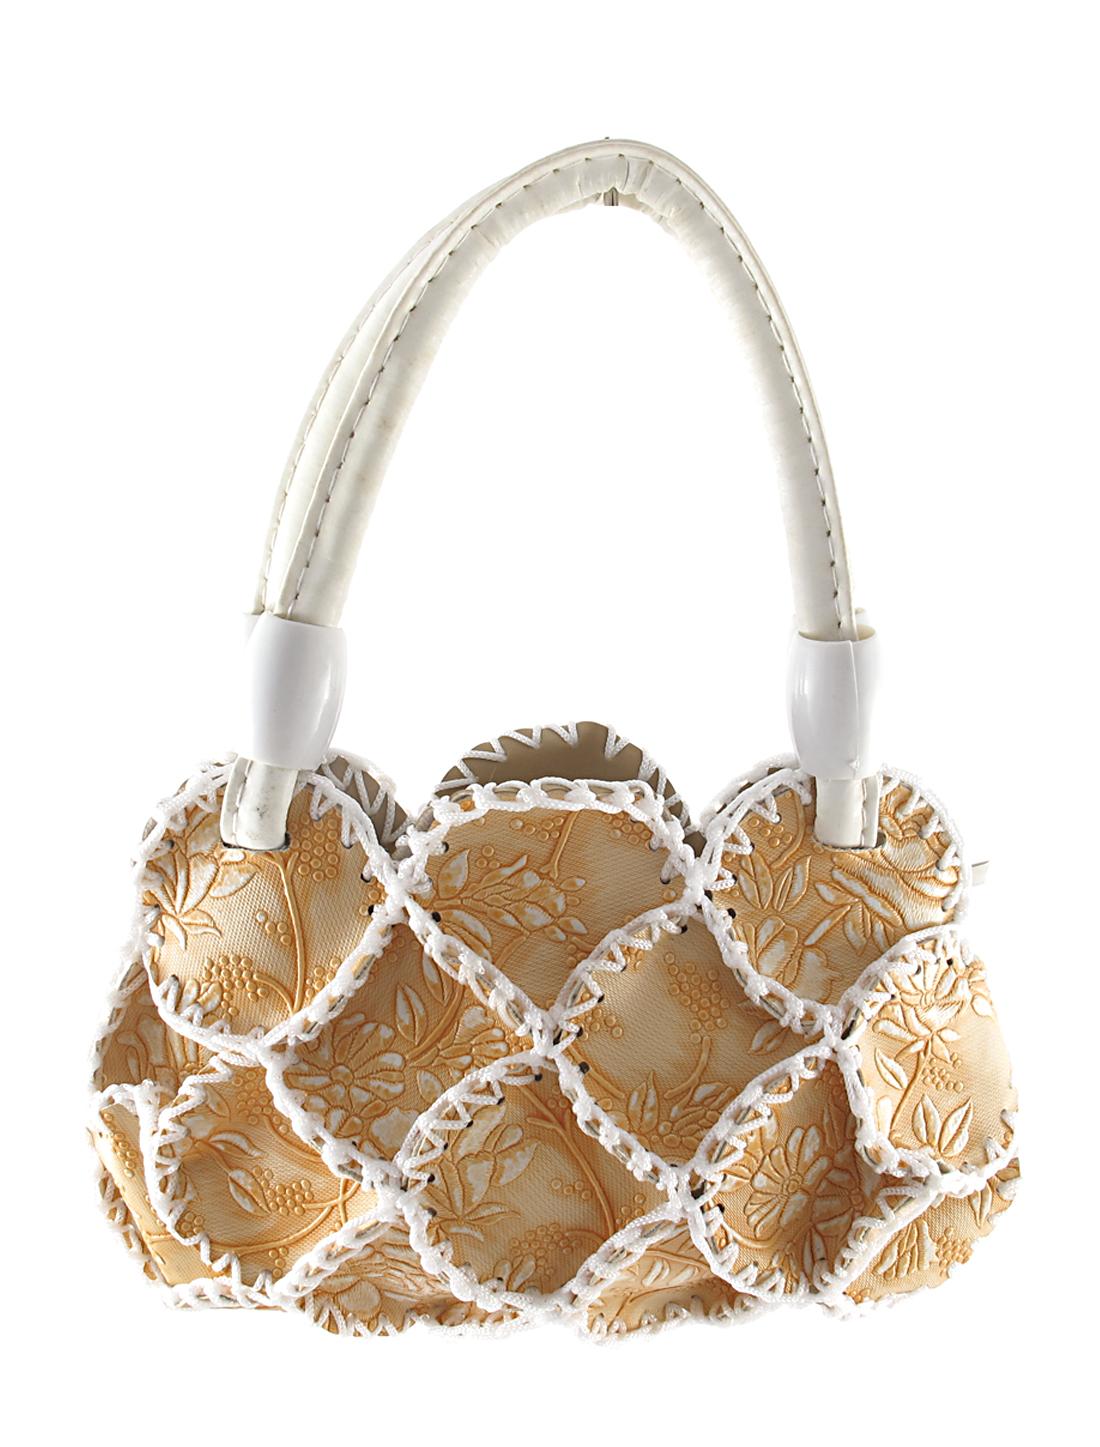 Lady Faux Leather Braided Flowers Detail Satchel Bag Handbag Orange